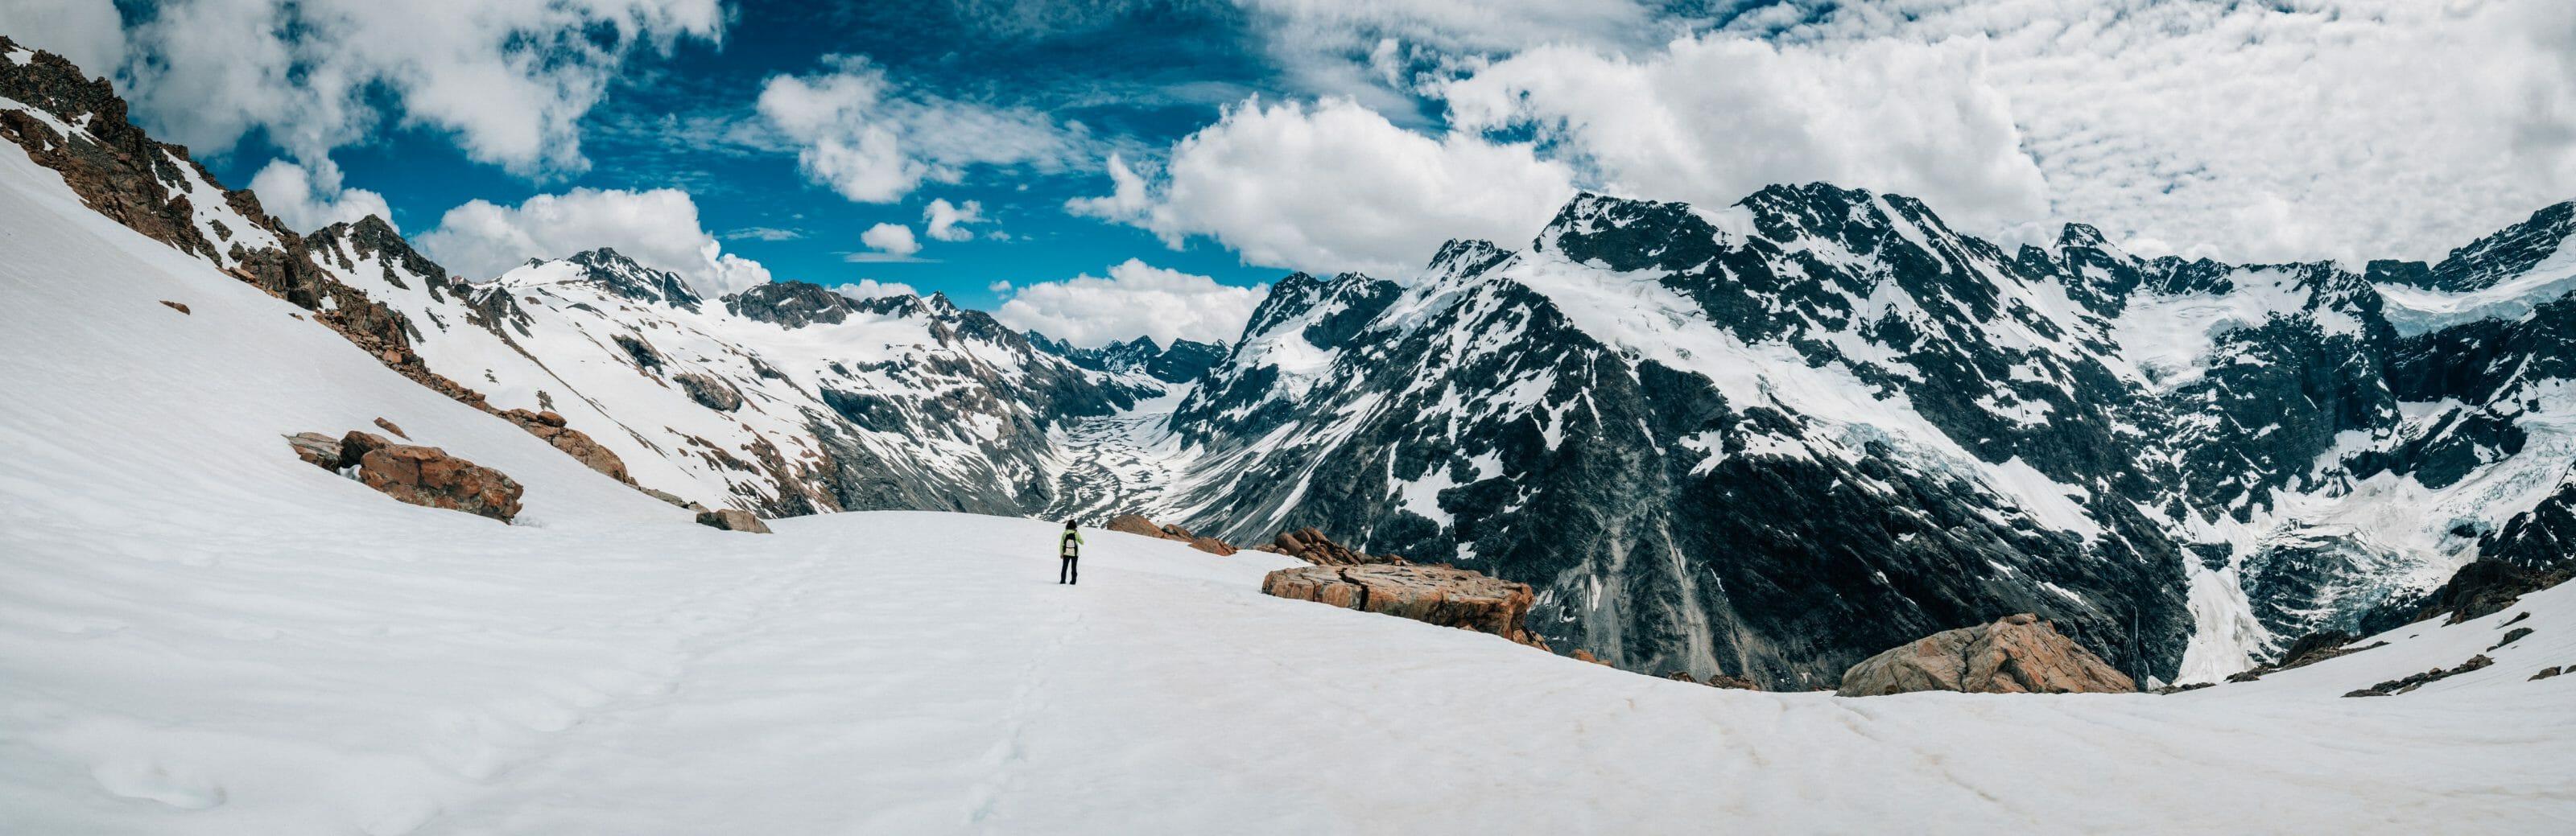 nepal tour du monde